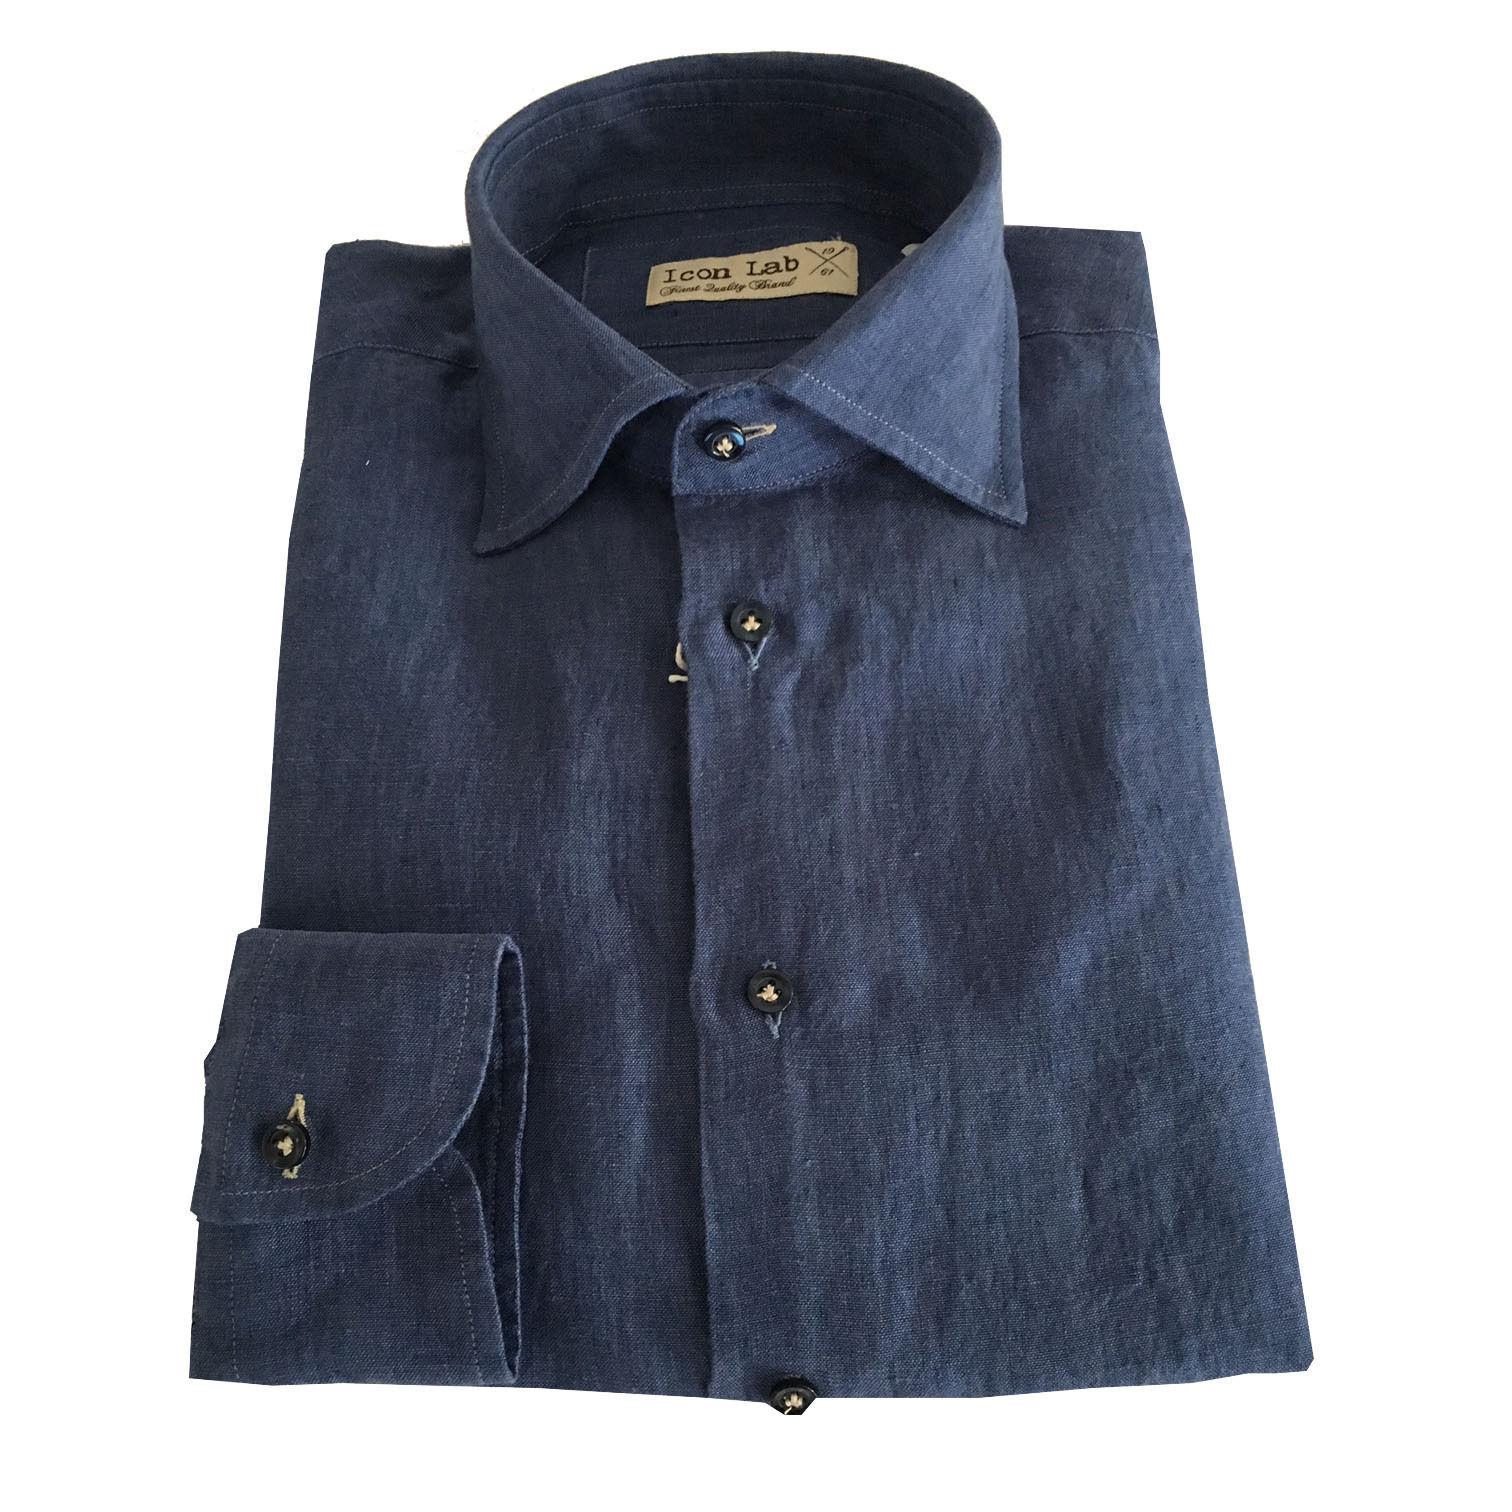 ICON LAB 1961 men's shirts long sleeve 100% linen denim bluee asola coloured